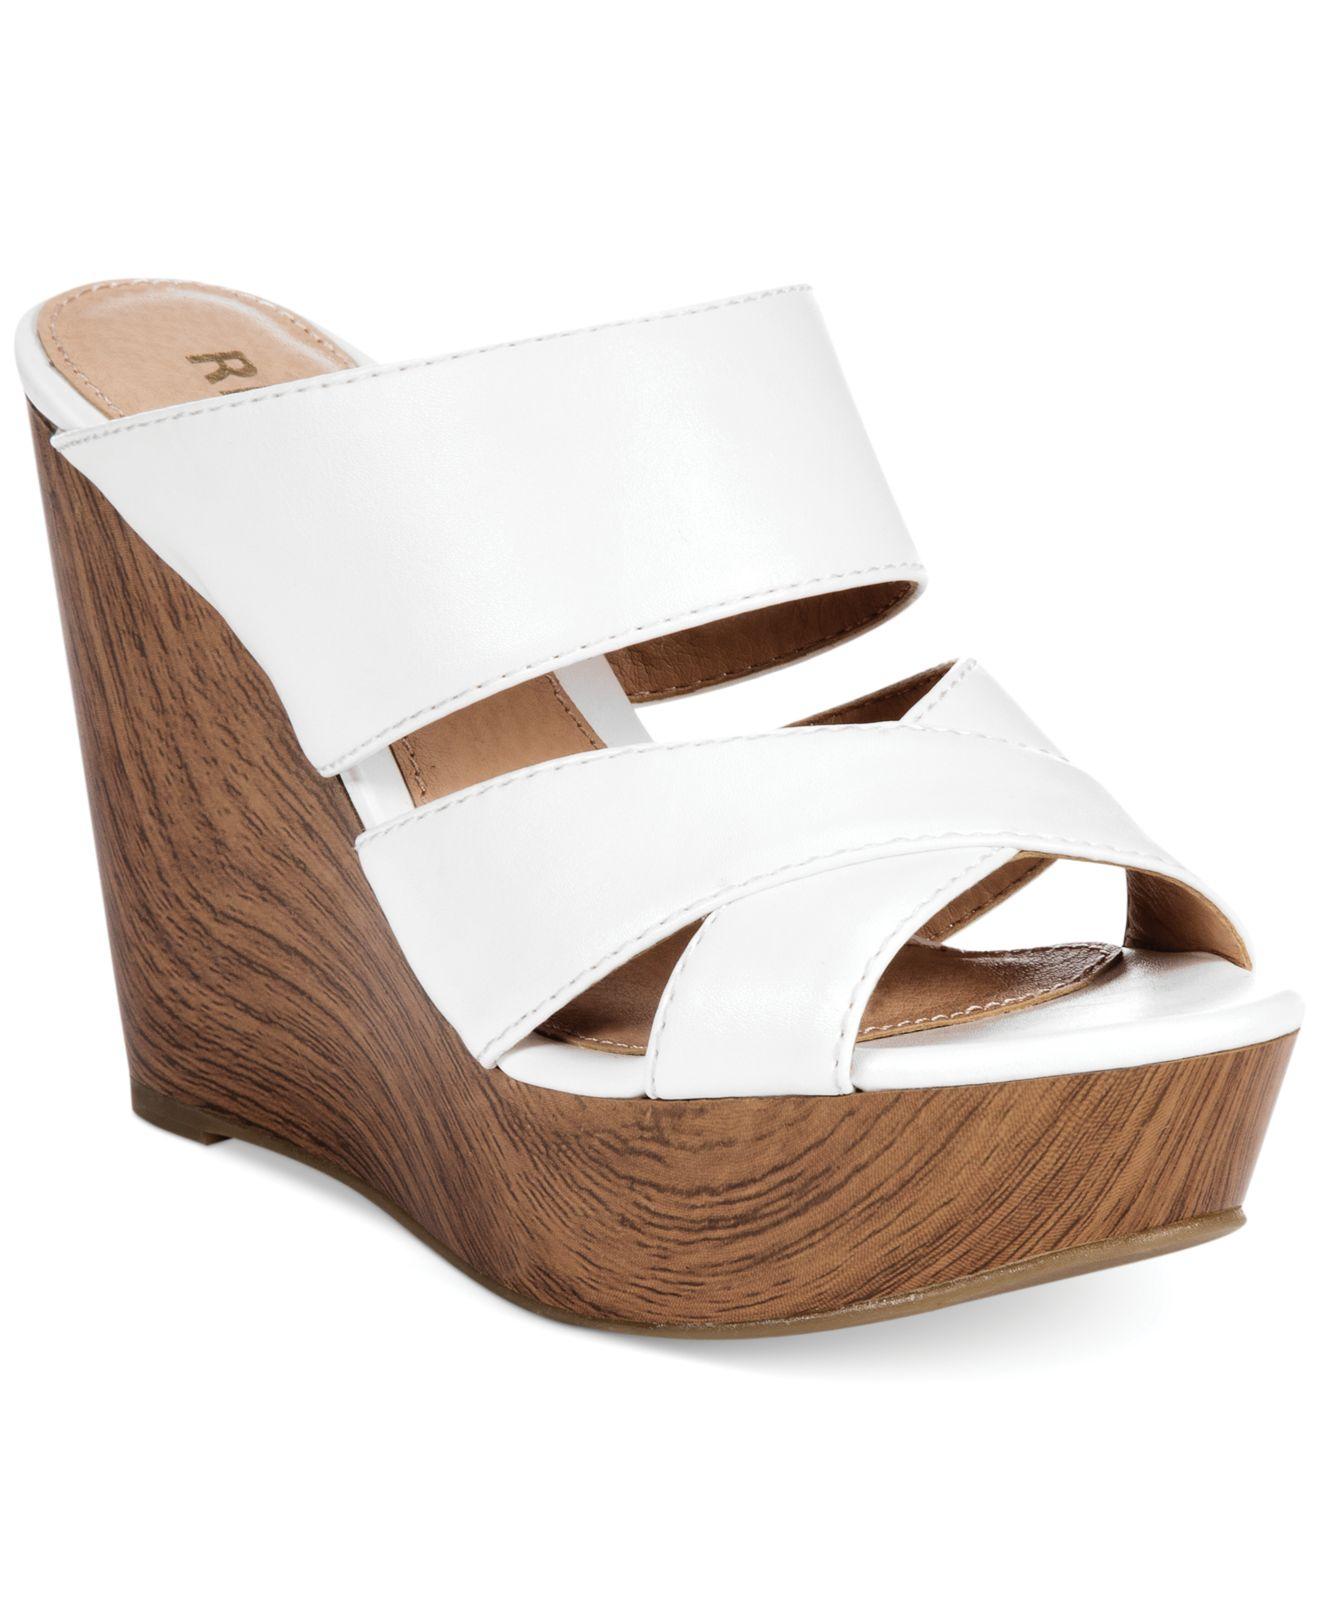 report everlynn platform wedge sandals in white lyst